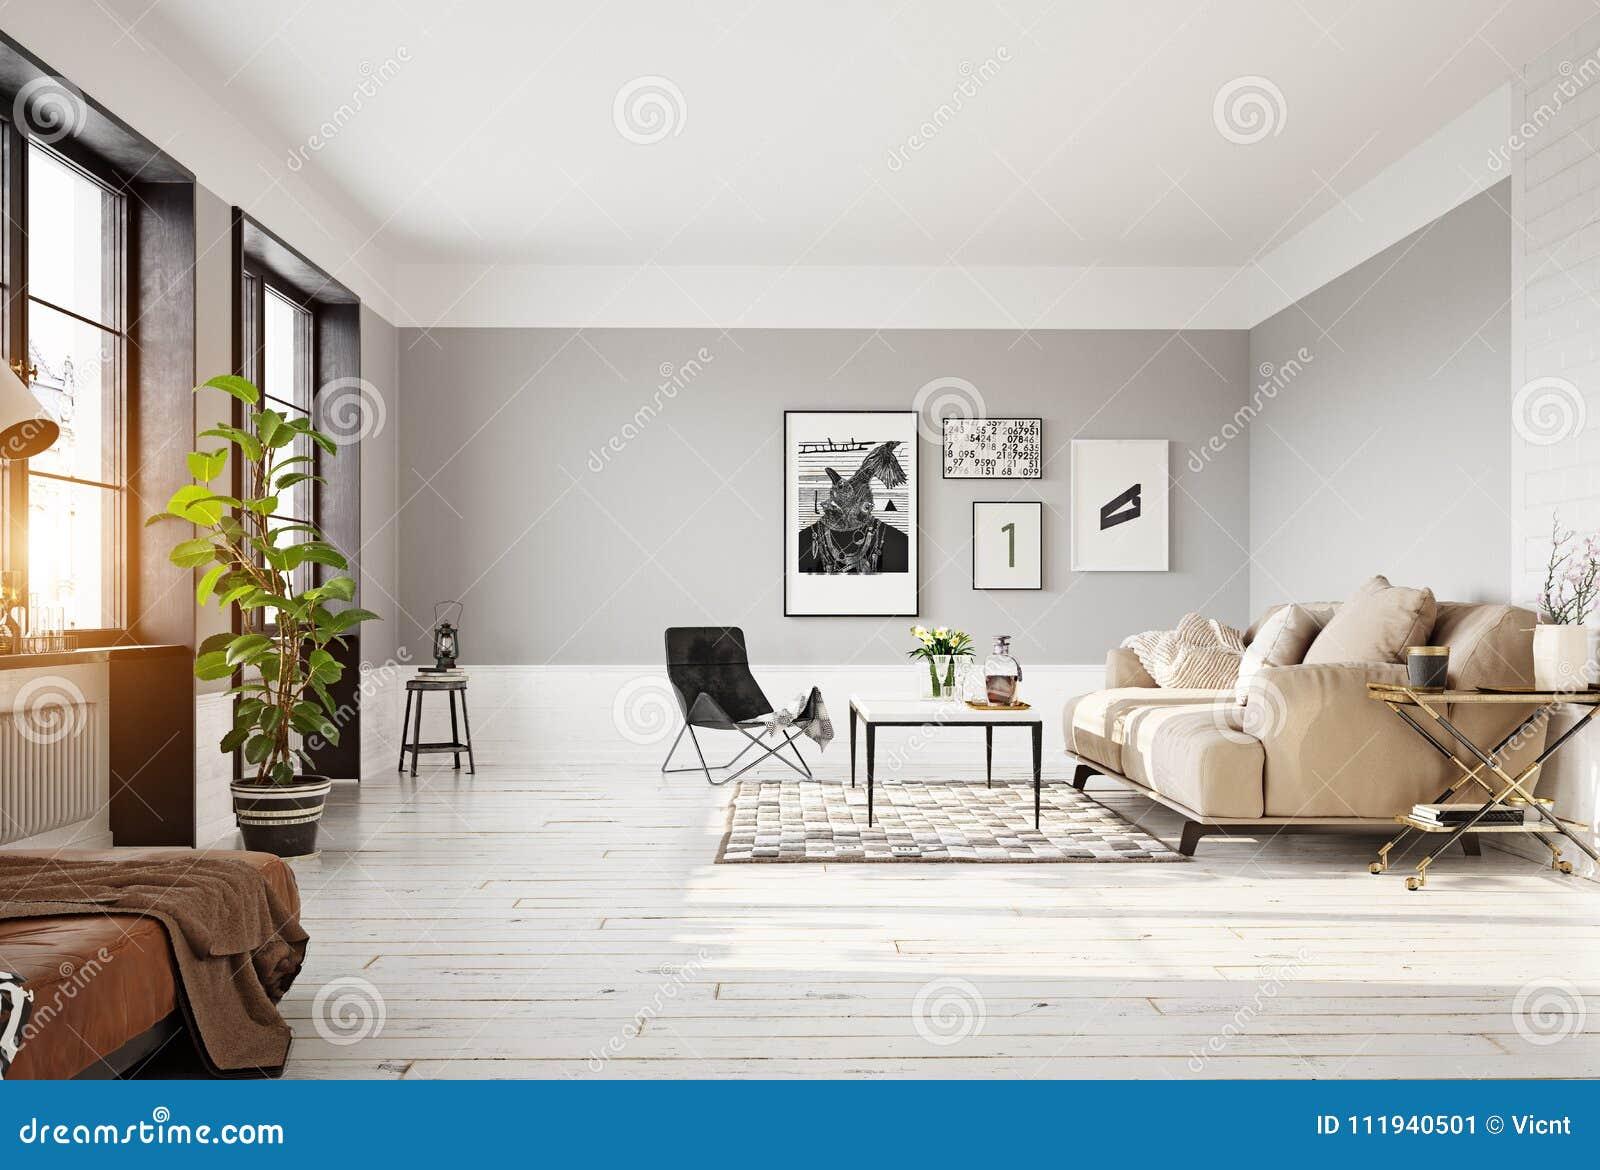 Modern Living Room Interior Stock Illustration Illustration Of Background House 111940501